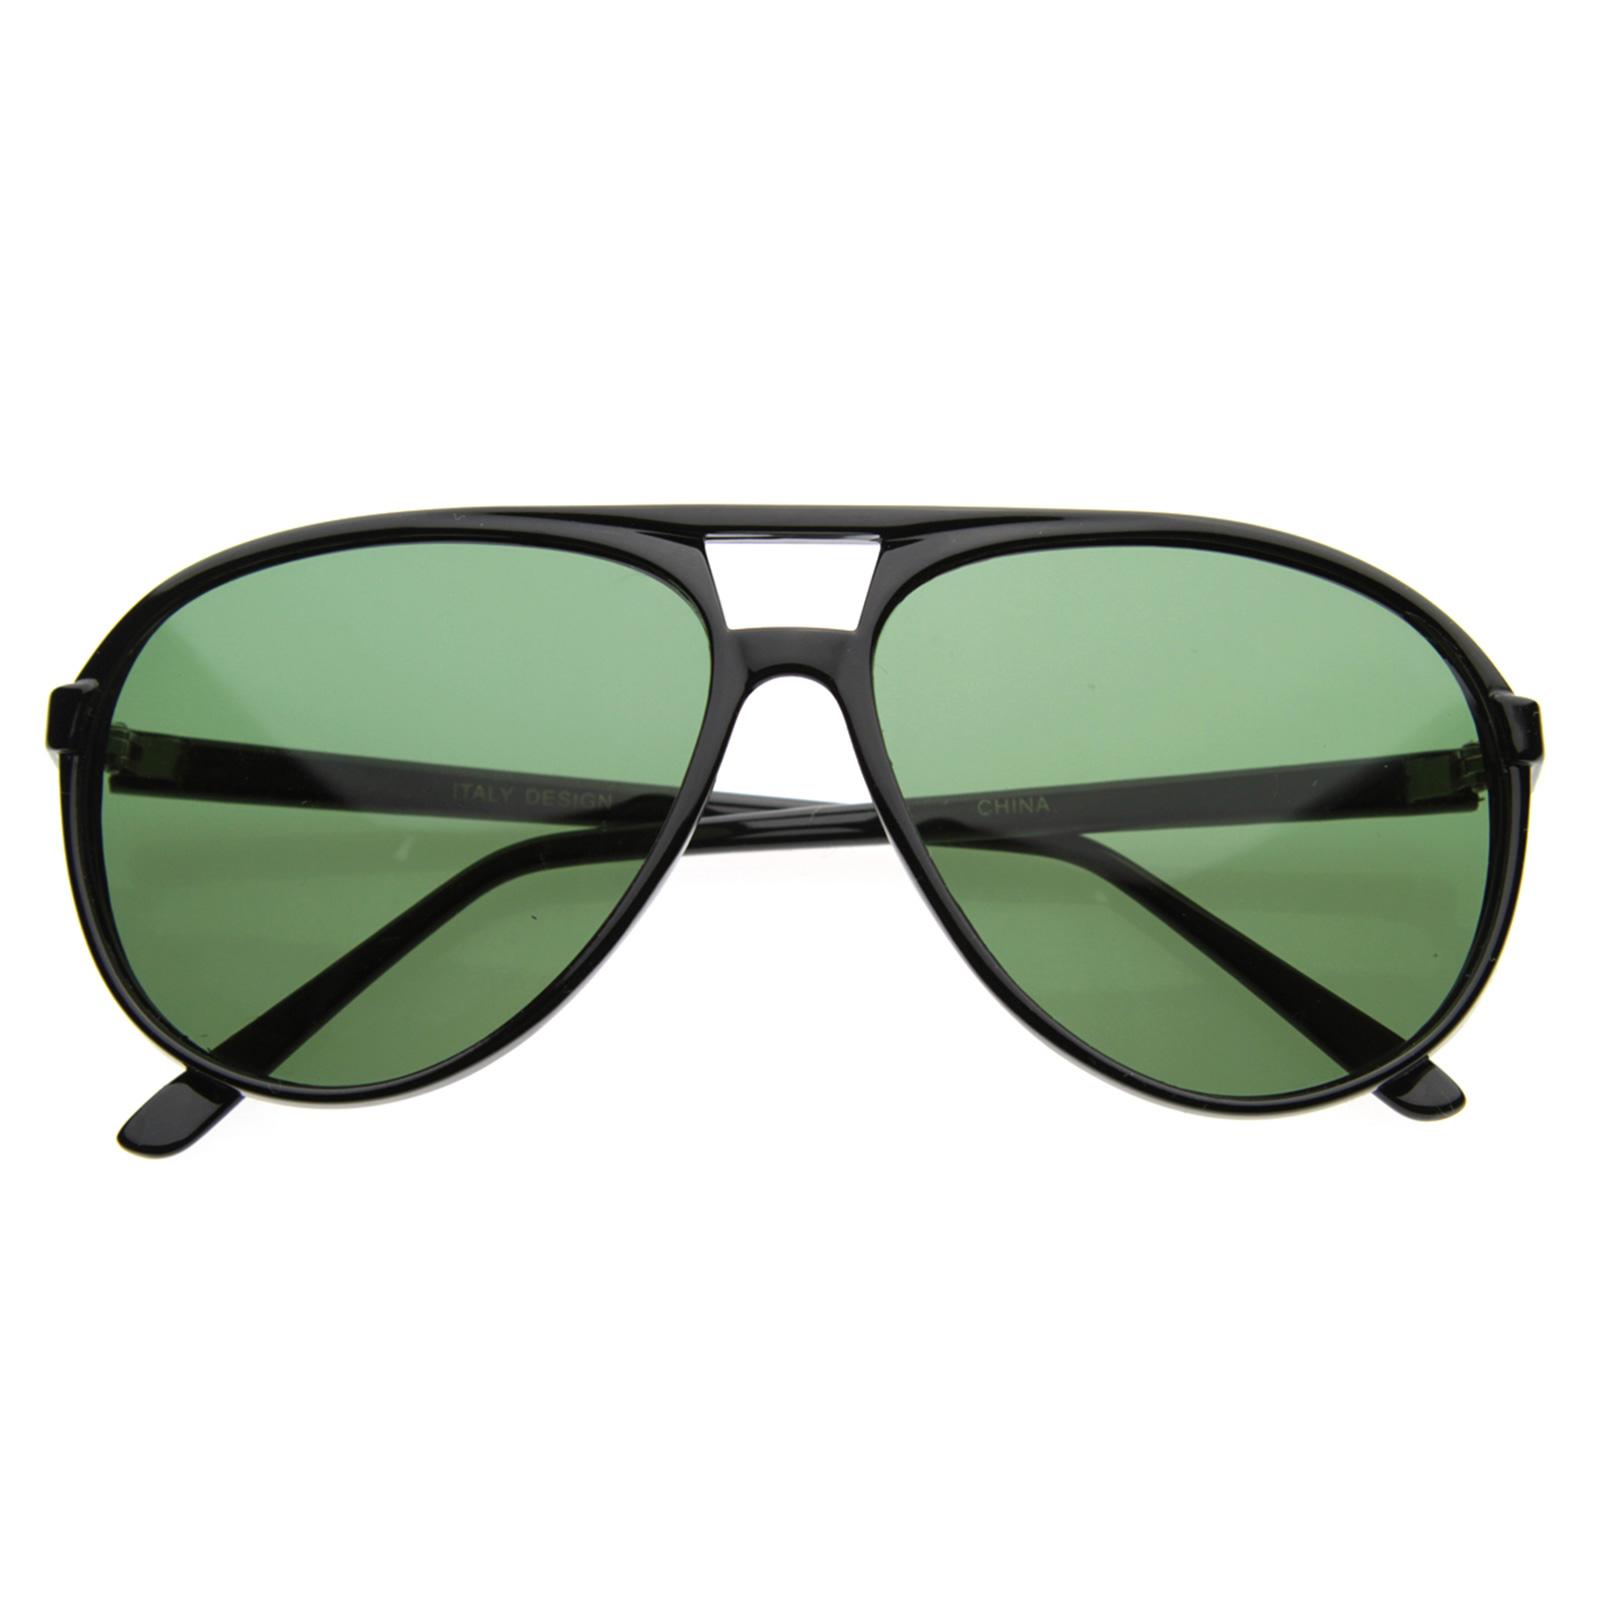 Retro-80s-Plastic-Classic-Teardrop-Aviators-Shades-Sunglasses-2339-Free-Pouch